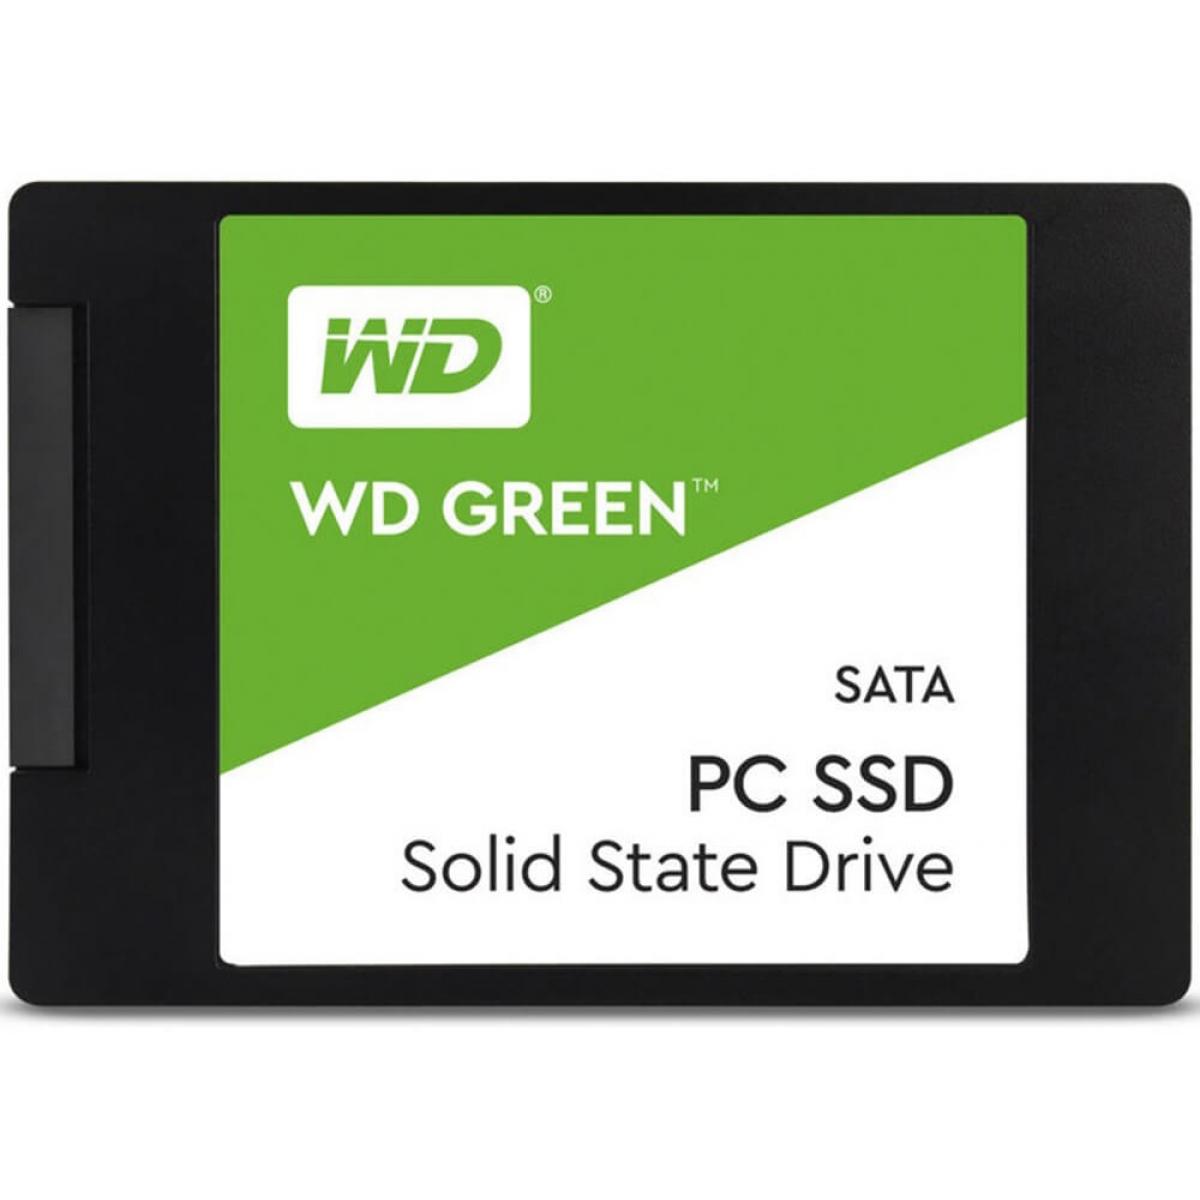 SSD WD Green 480GB, Sata III, Leitura 545MBs e Gravação 430MBs, WDS480G2G0A